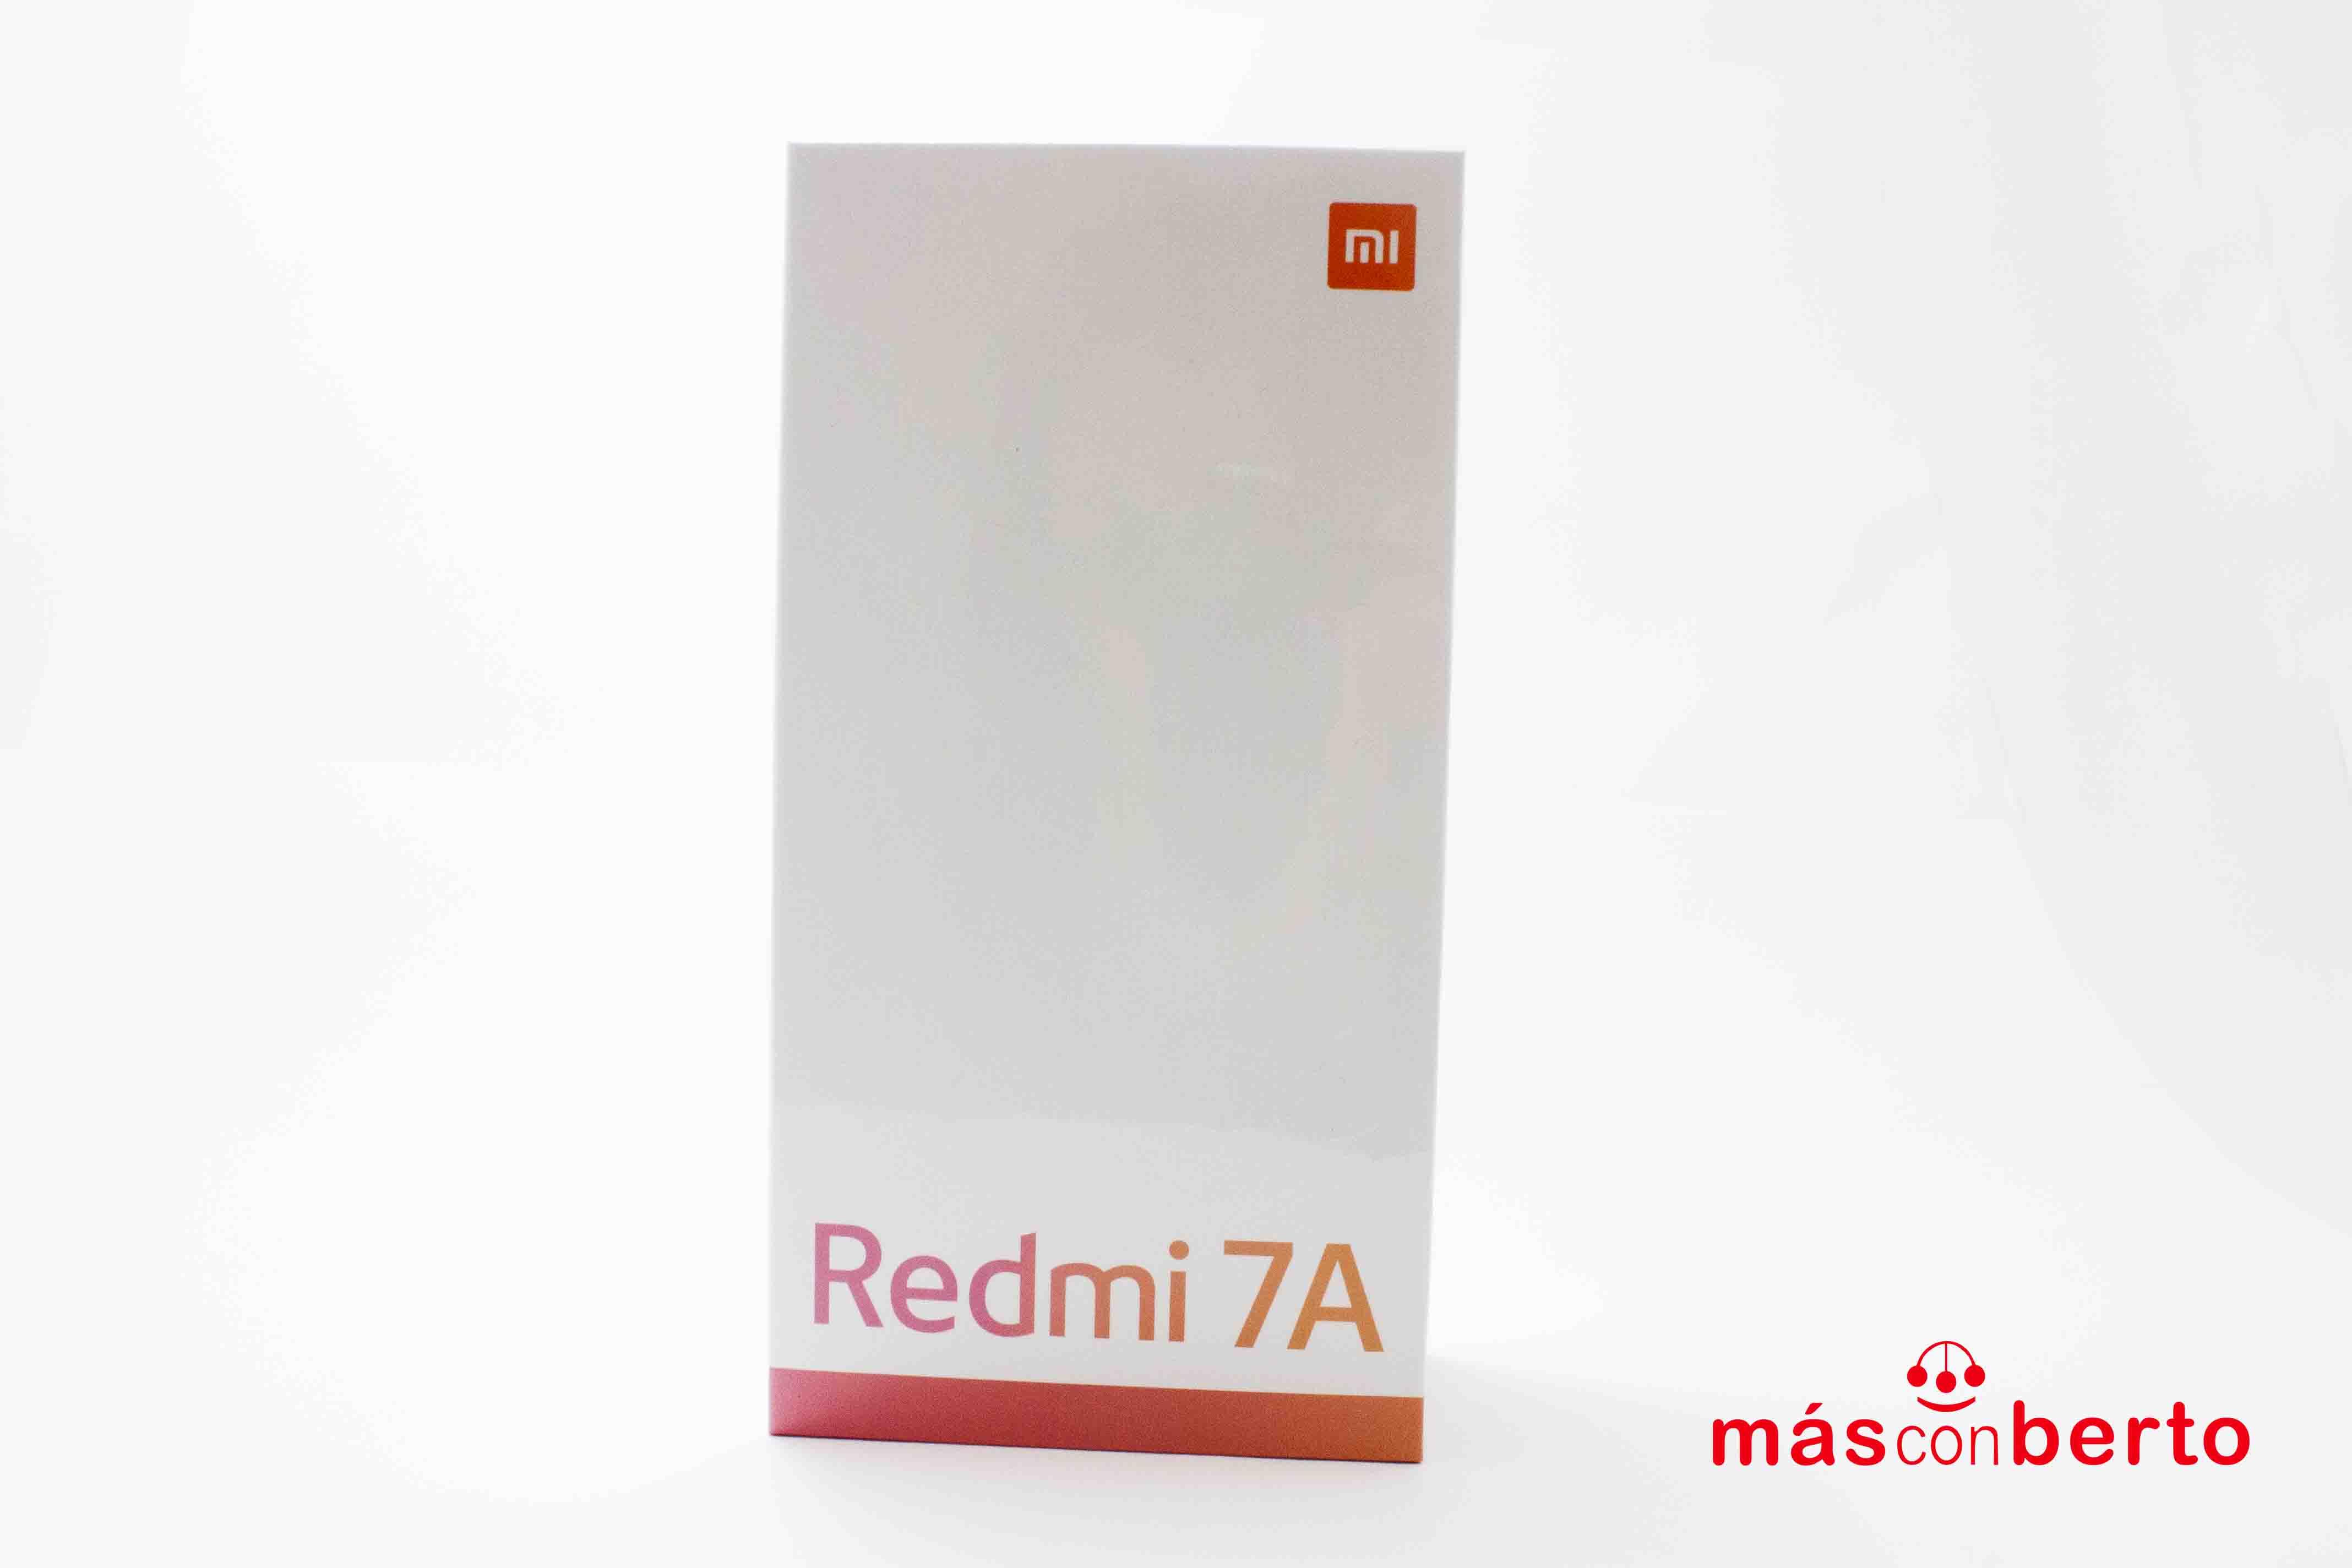 Móvil Xiaomi Redmi 7A NUEVO